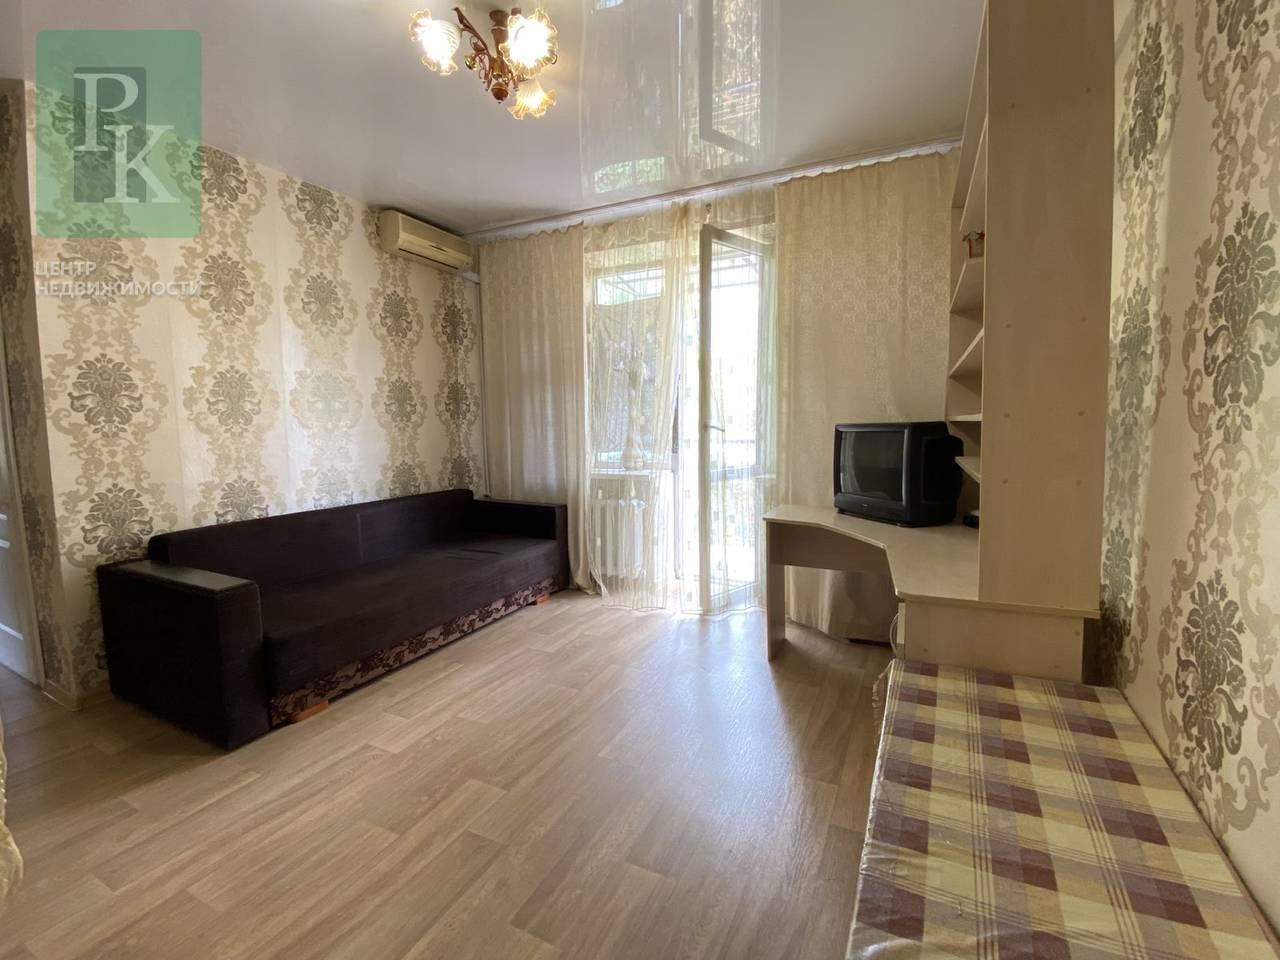 Двухкомнатная квартира на Гоголя